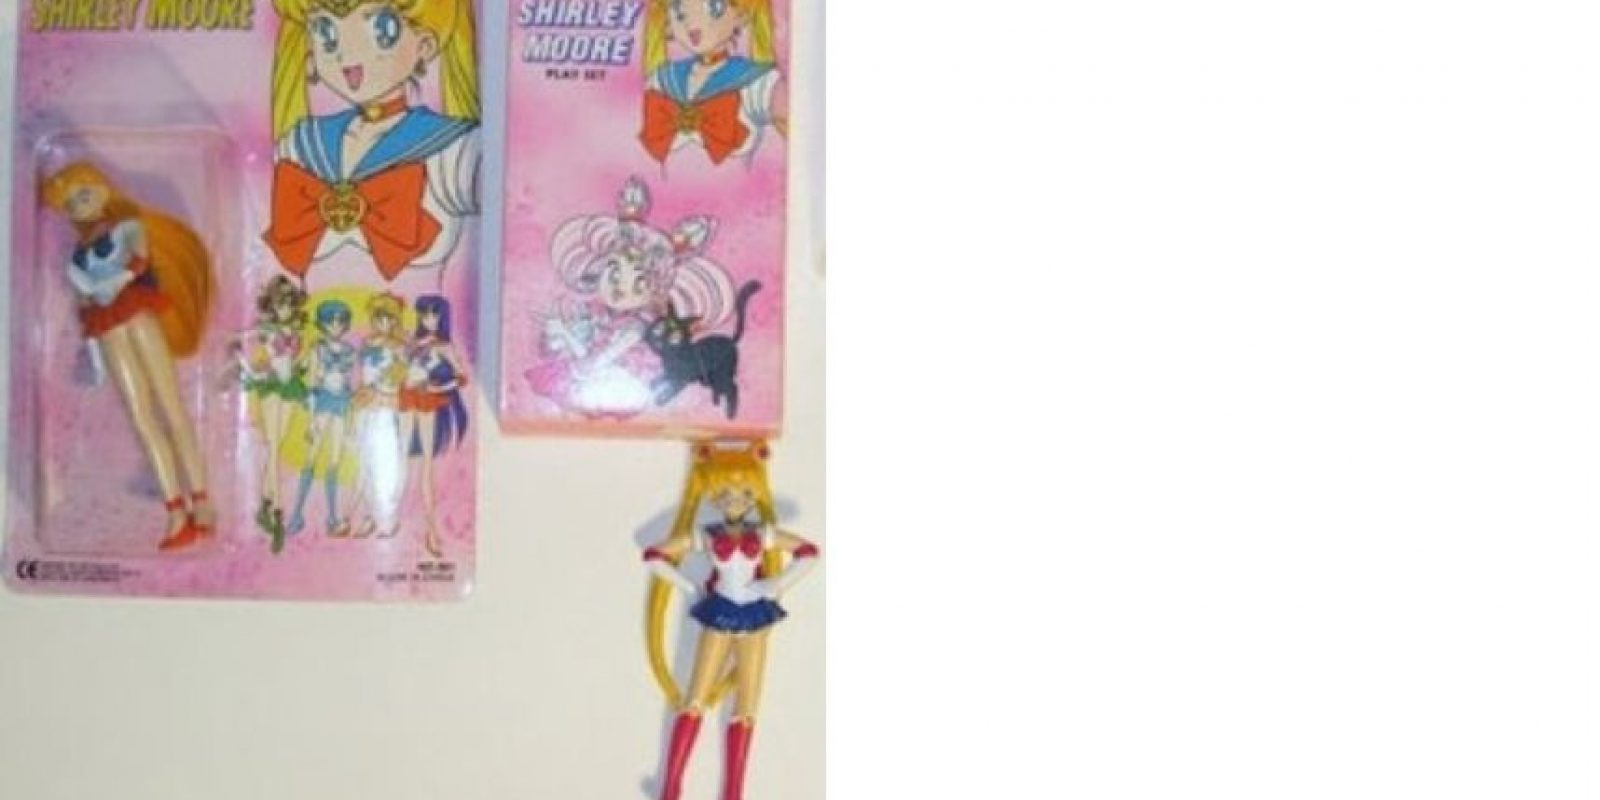 Le cambiaron el nombre a Sailor Moon Foto:Tumblr/Bootleg Toys